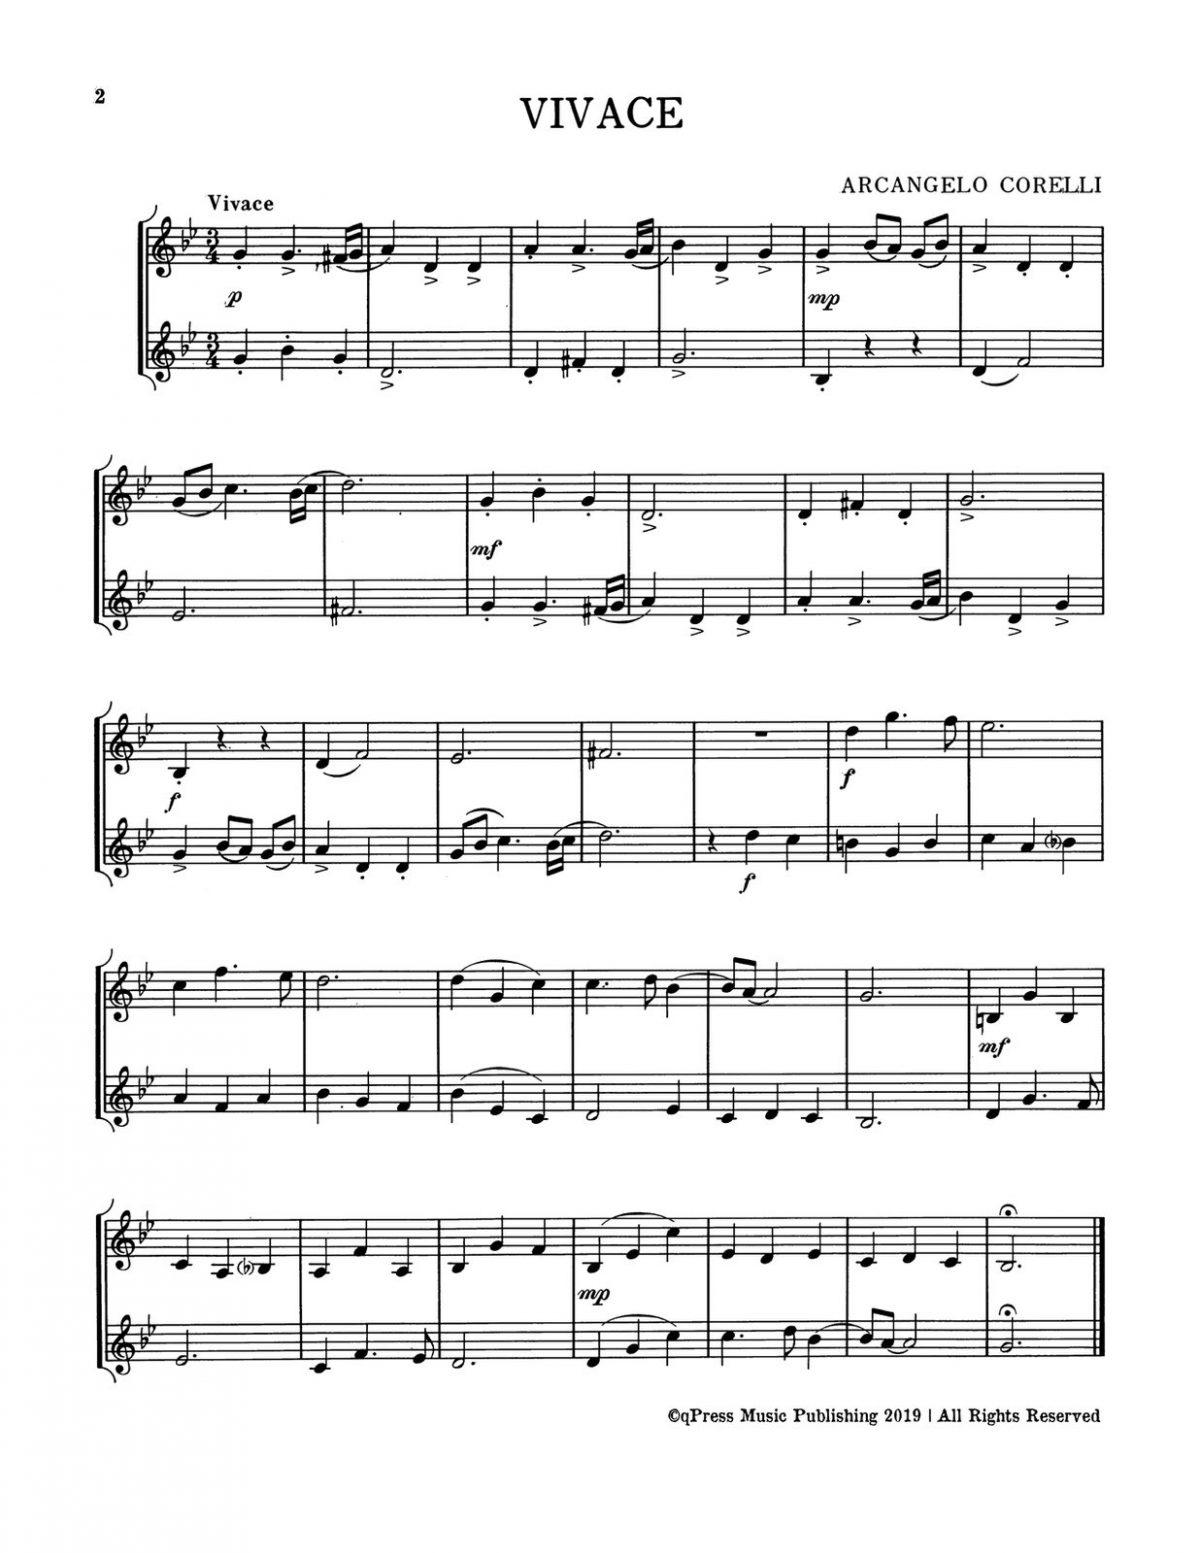 Schaeffer, Trumpets Two-p04